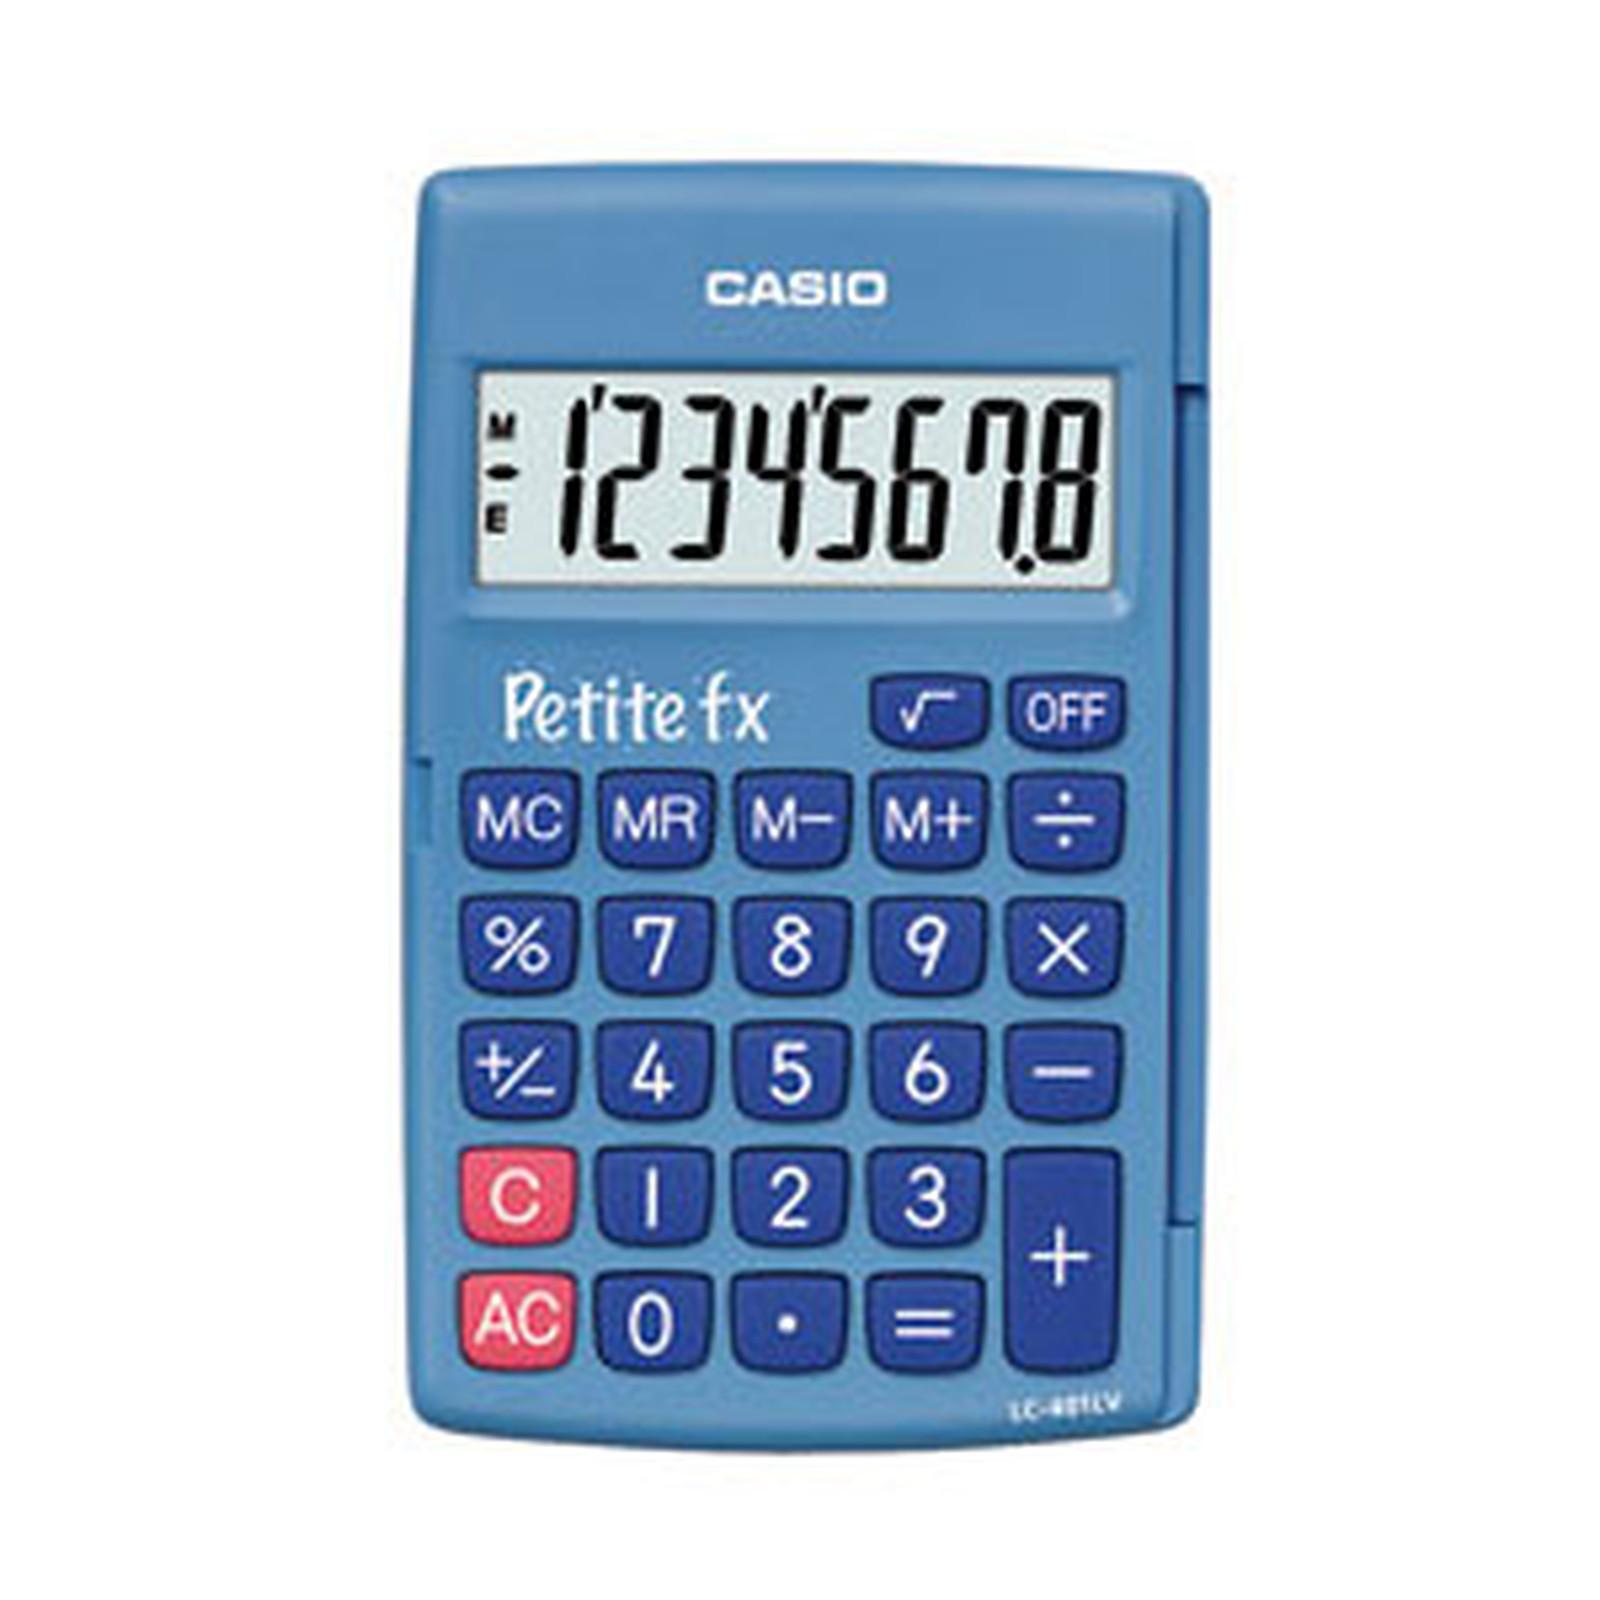 Casio Petite FX Blue - Calculadora de bolsillo de CP a CE2